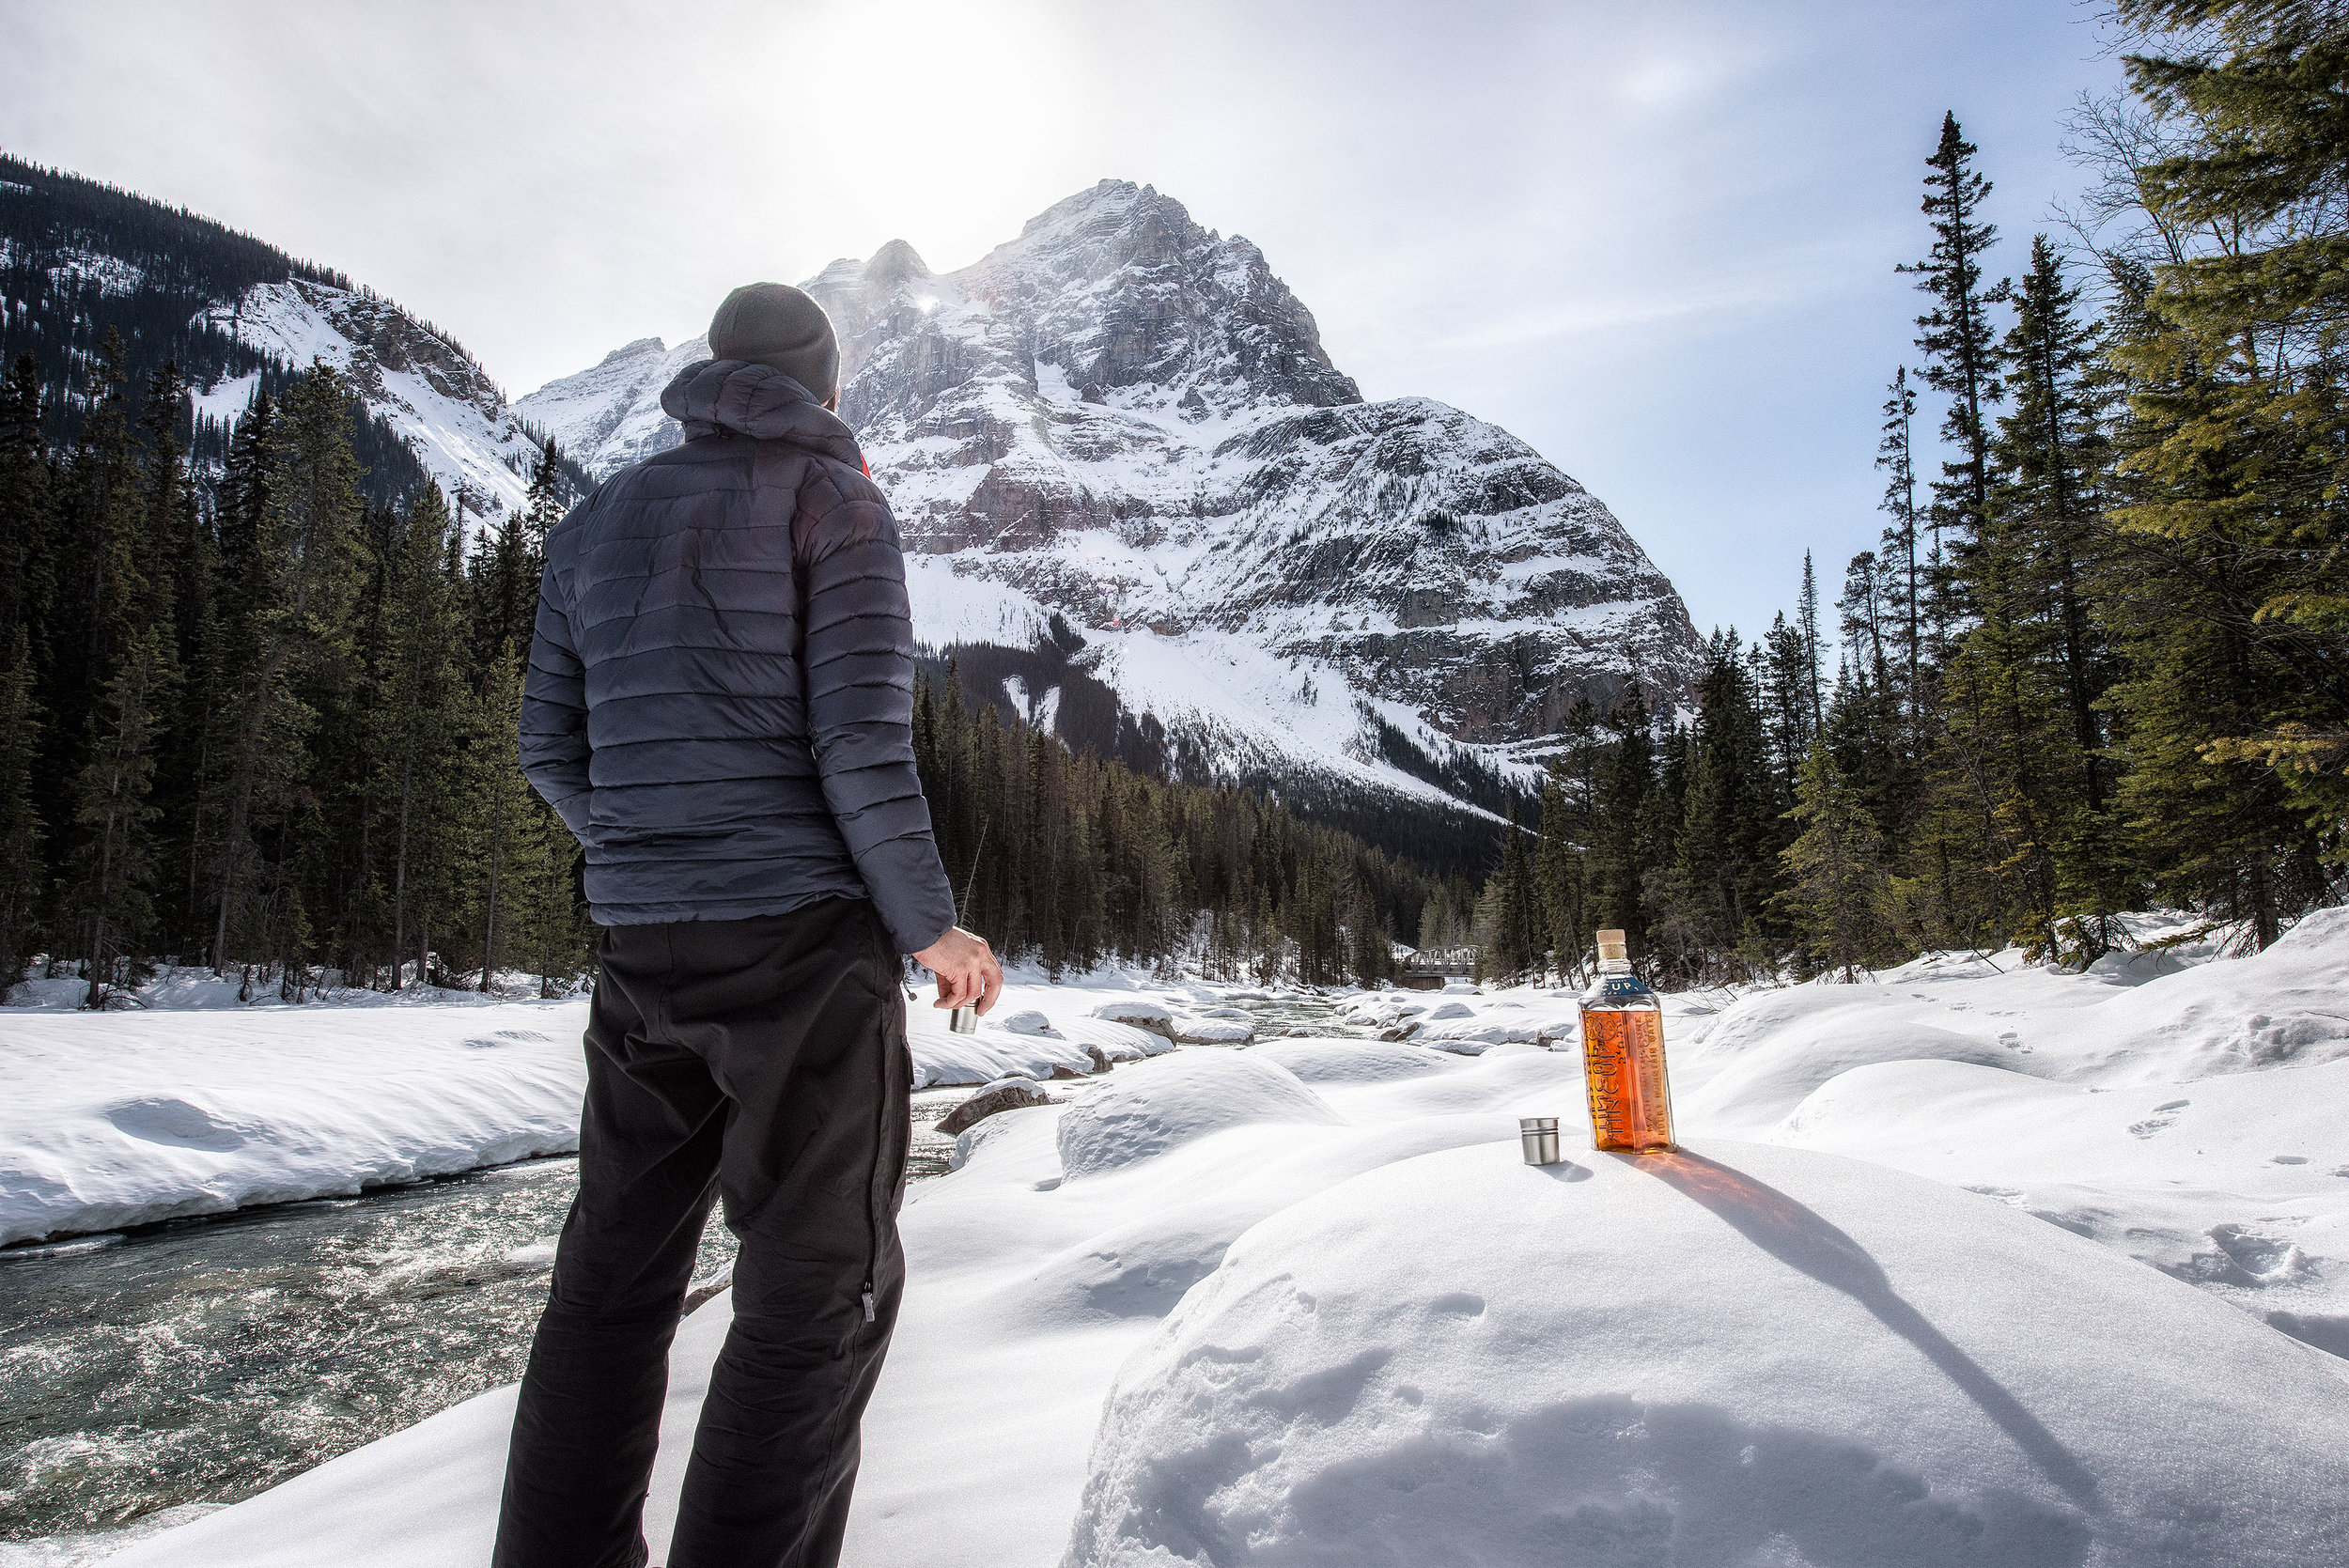 austin-trigg-whiskey-banff-alberta-product-TINCUP-Field-Alberta-River-bottle-snow-day-time.jpg